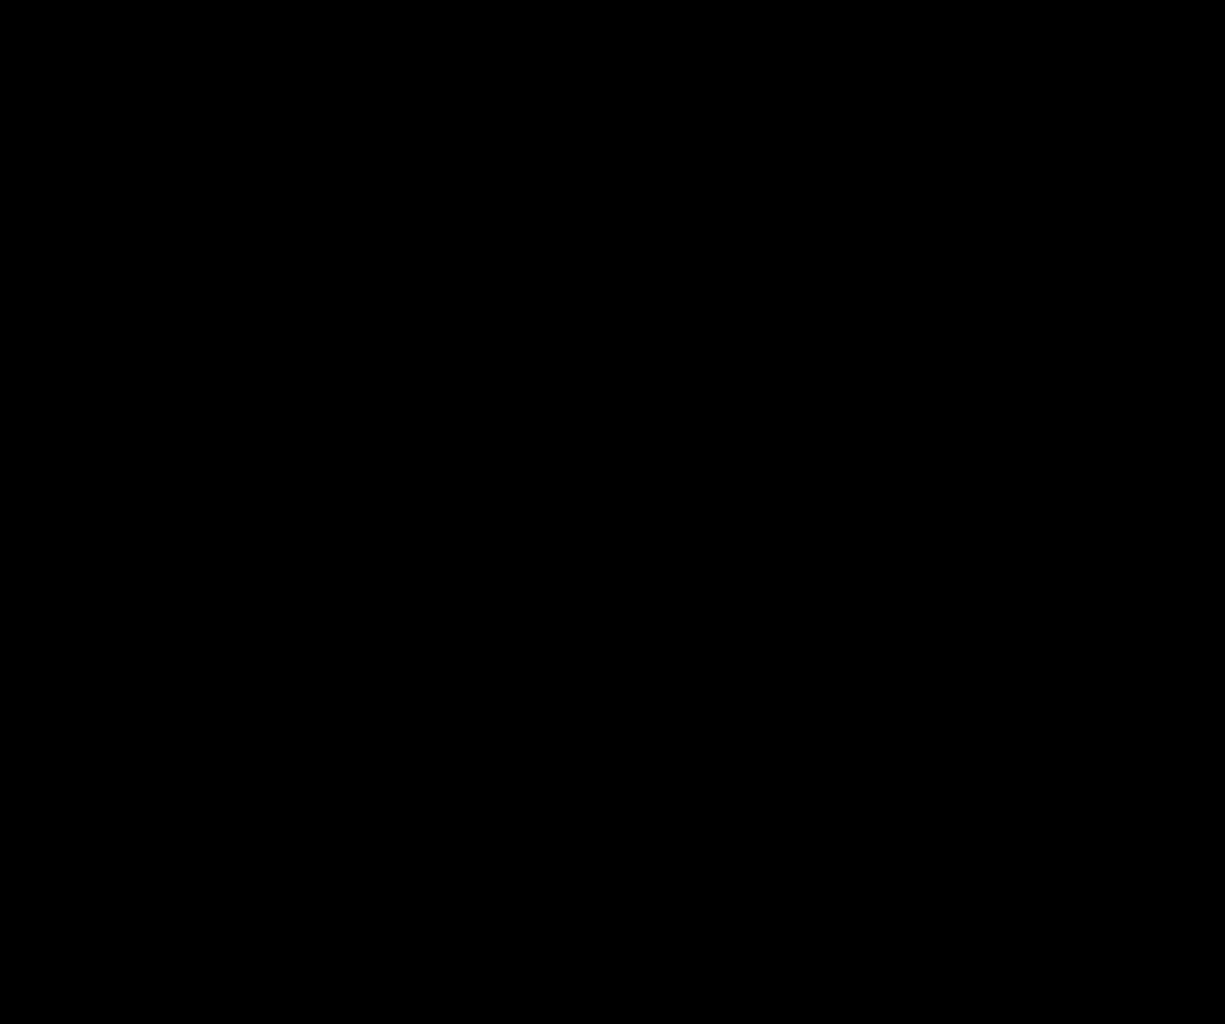 Court clipart libra. Horoscopes march symbol